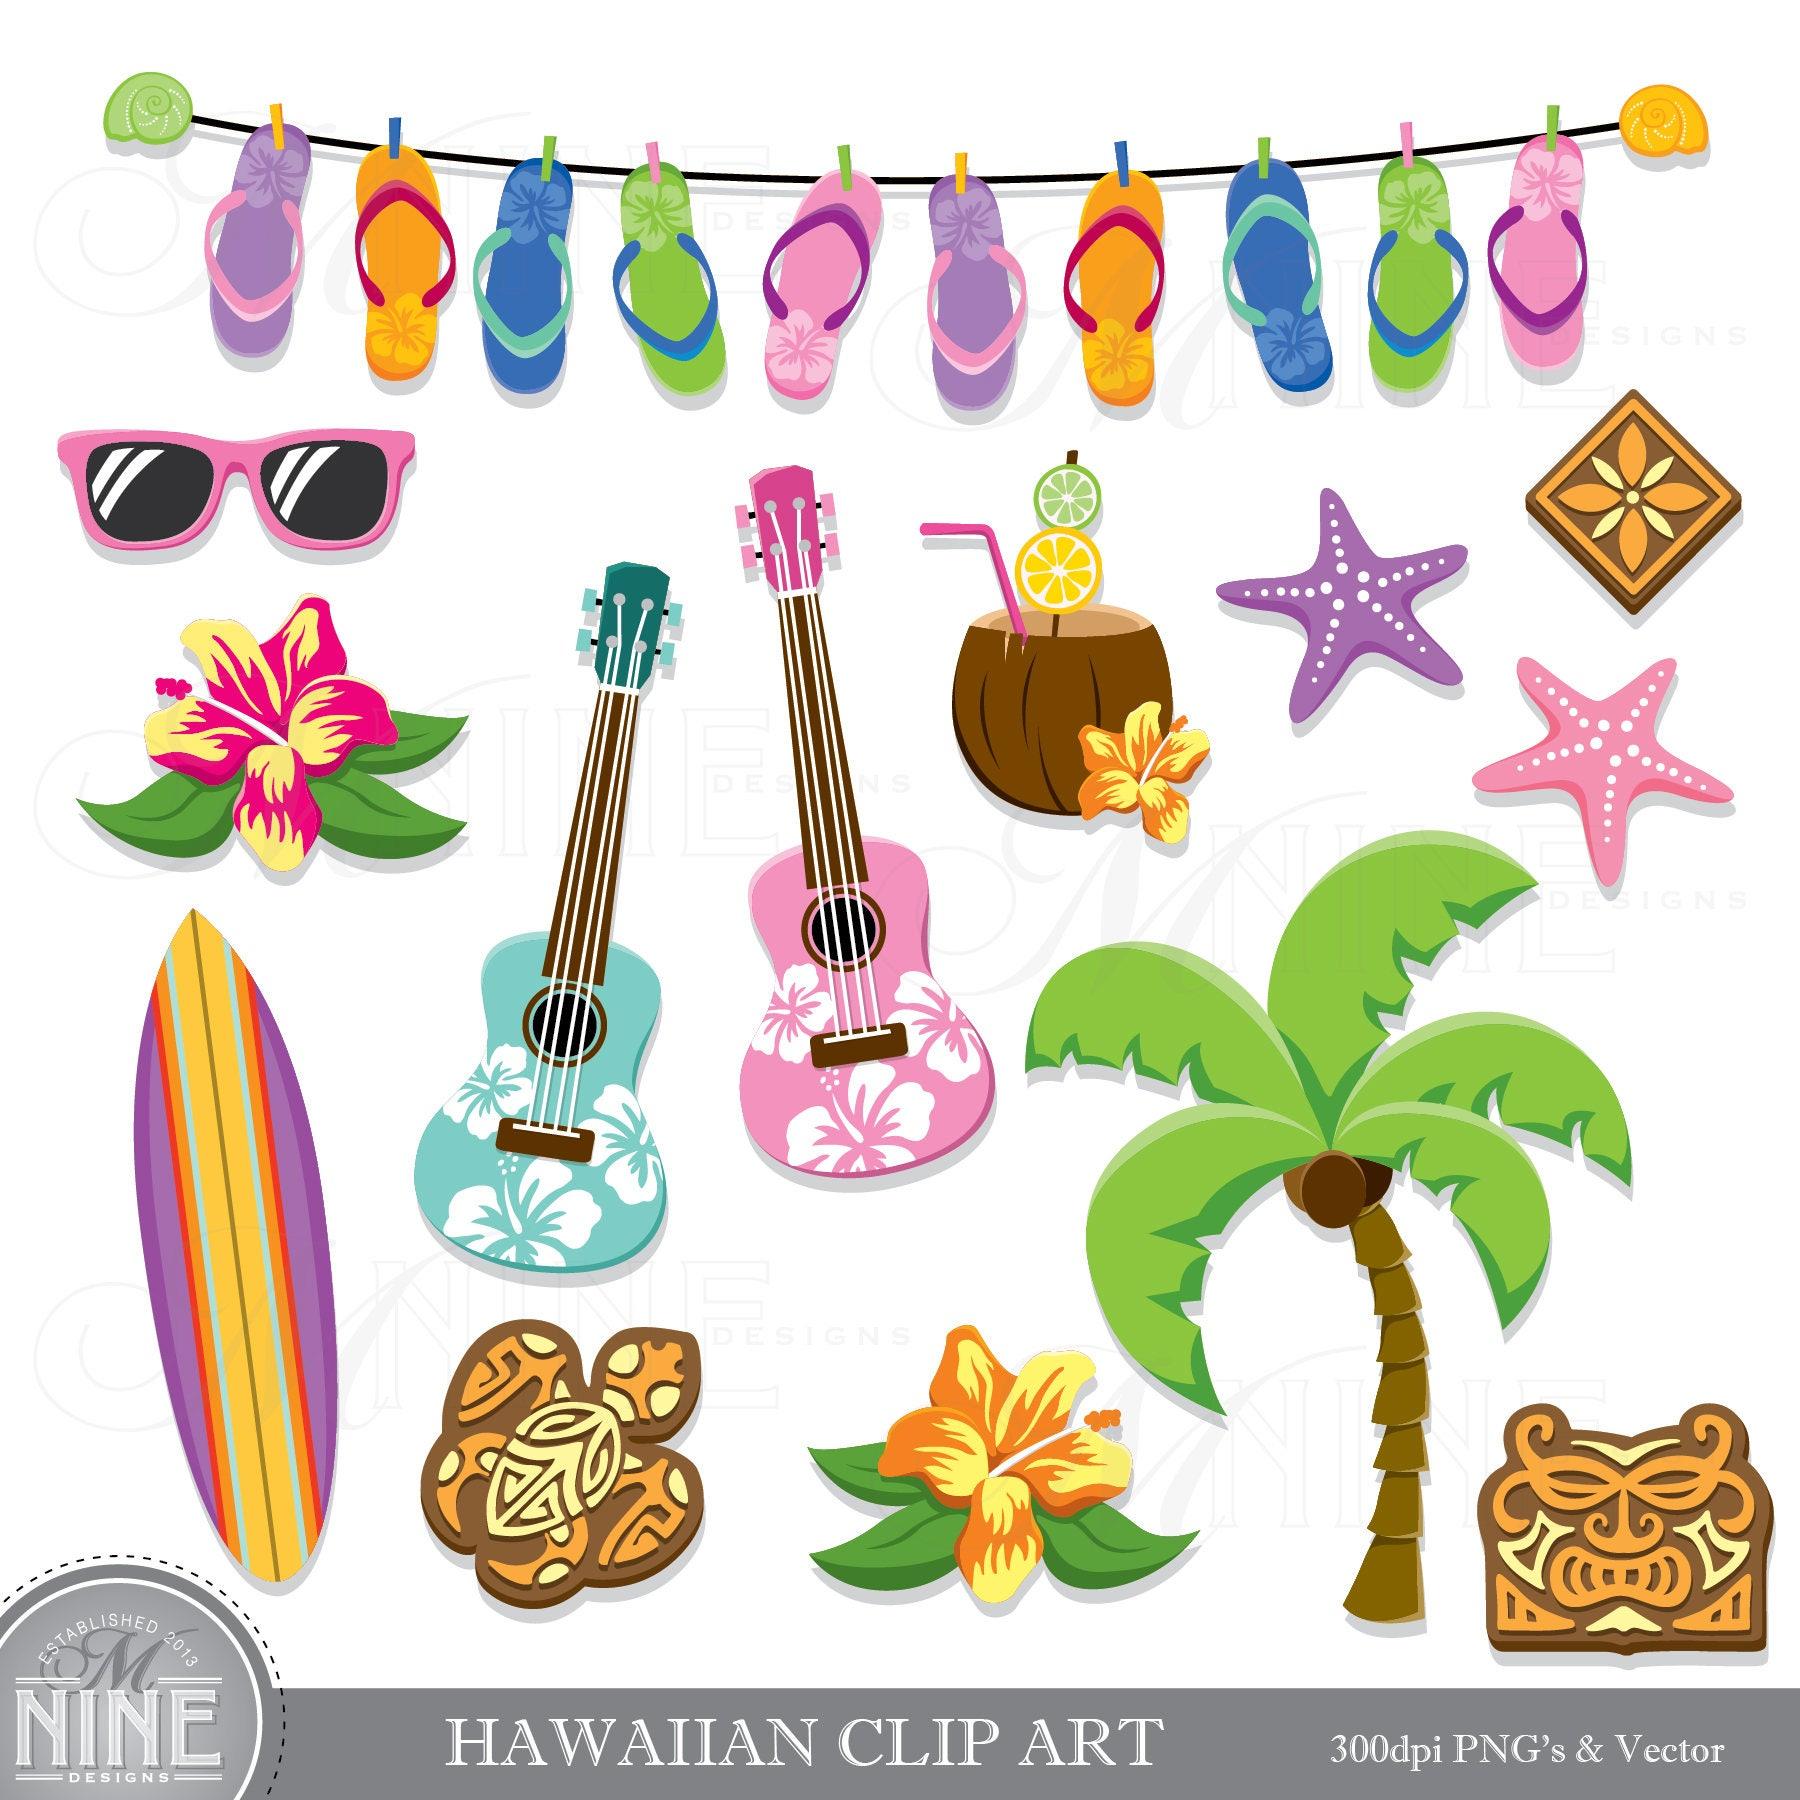 HAWAIIAN Clip Art / Hawaii Theme Clipart Downloads / Luau Clip